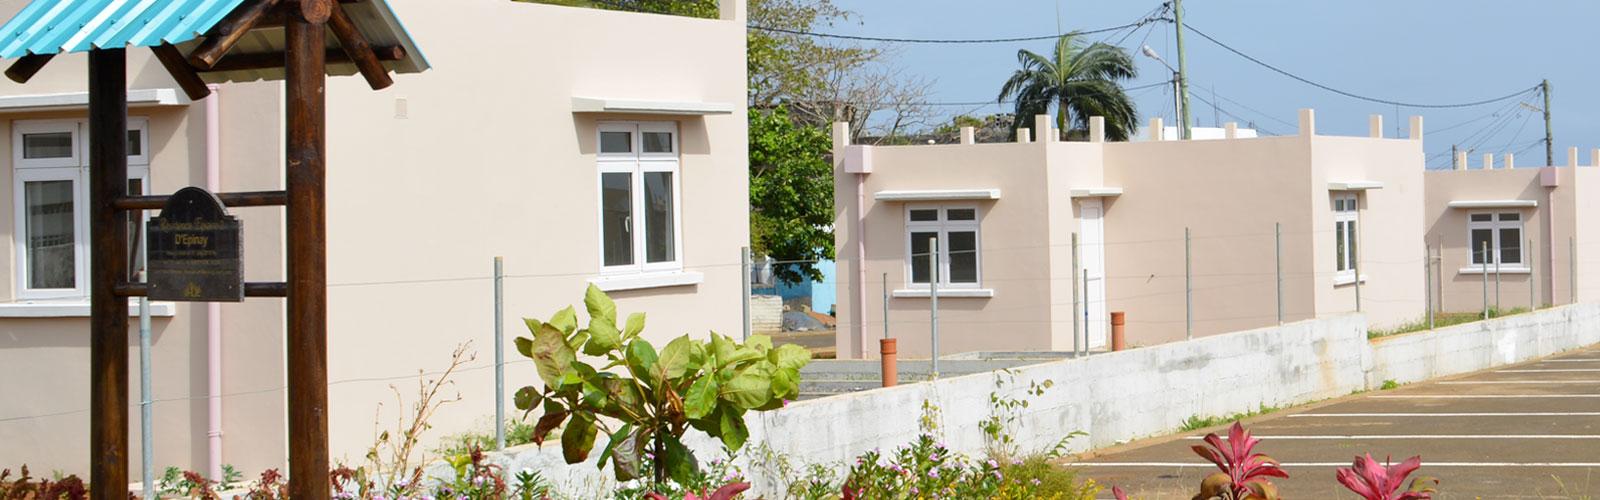 National Housing Developement Company Ltd